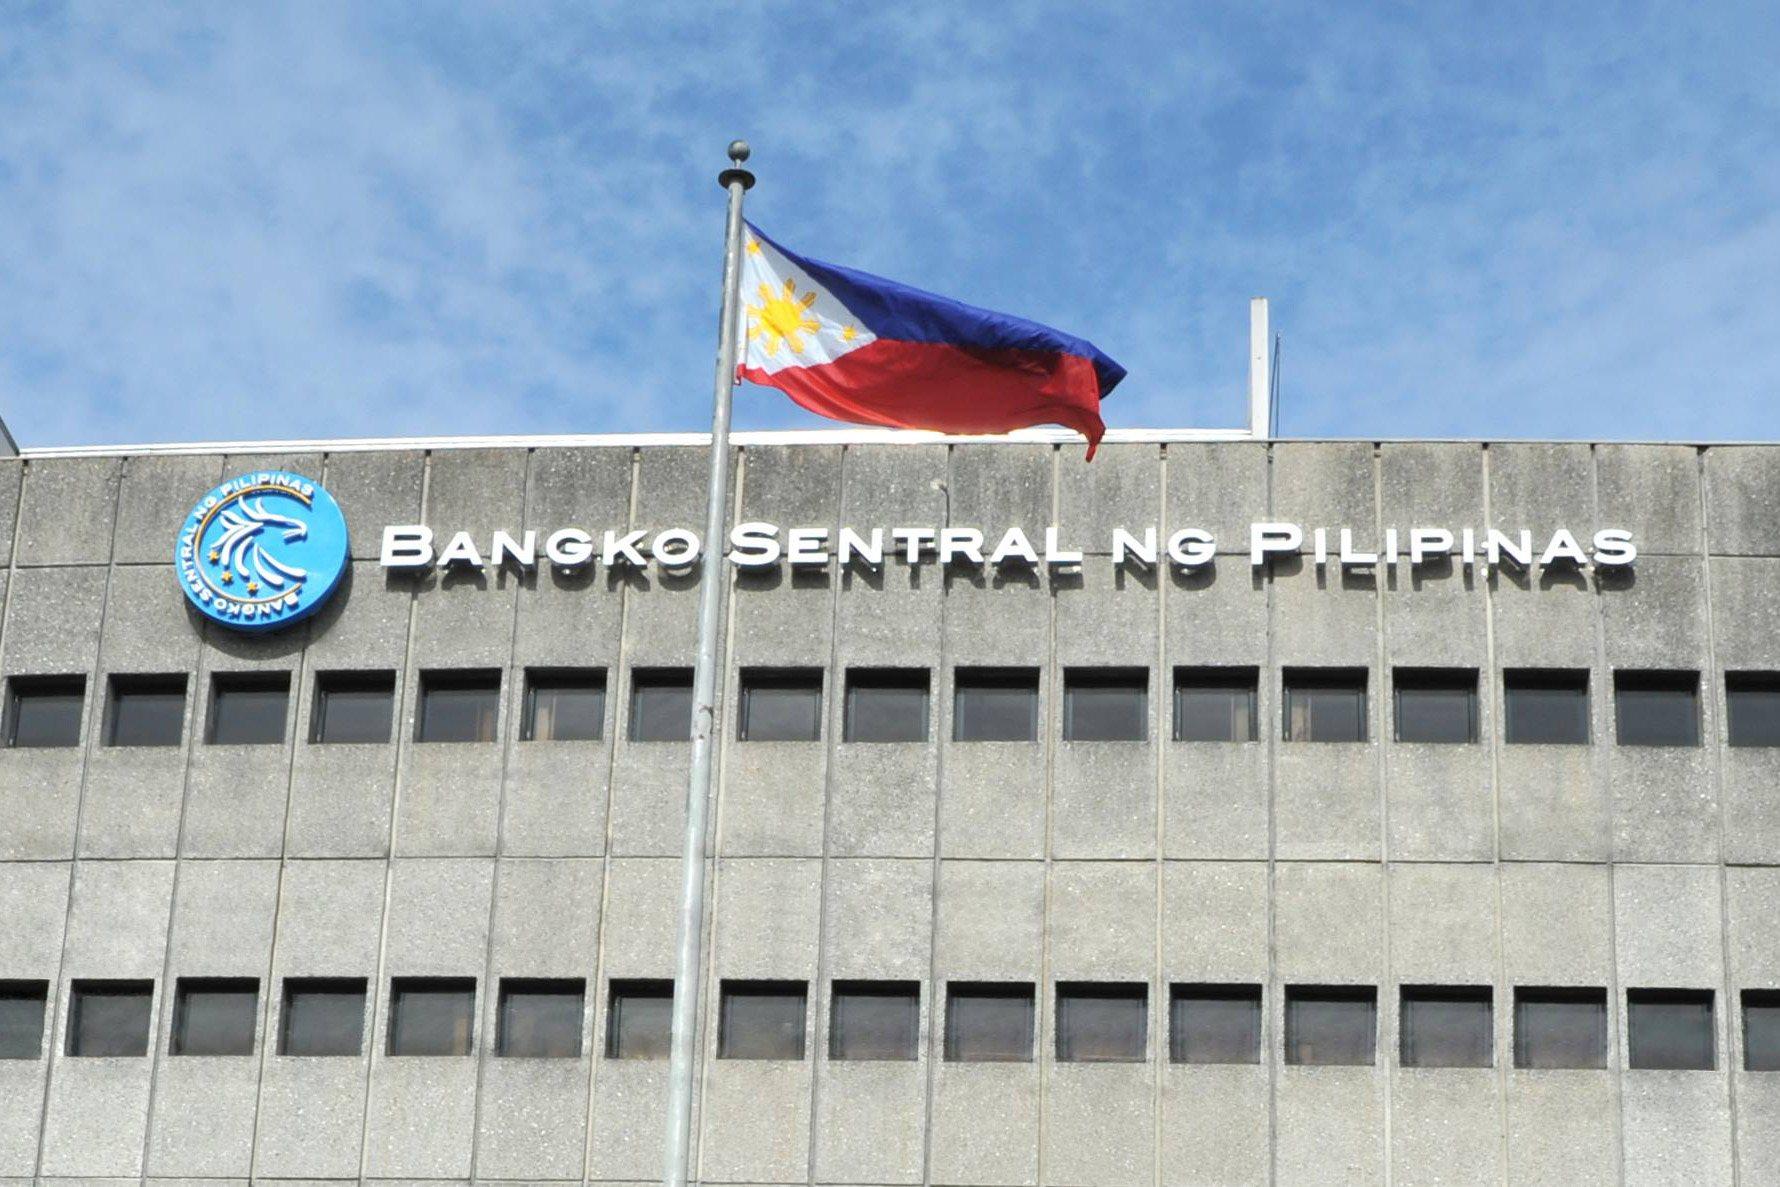 2 Singaporean fintech firms receive Philippine digital bank license